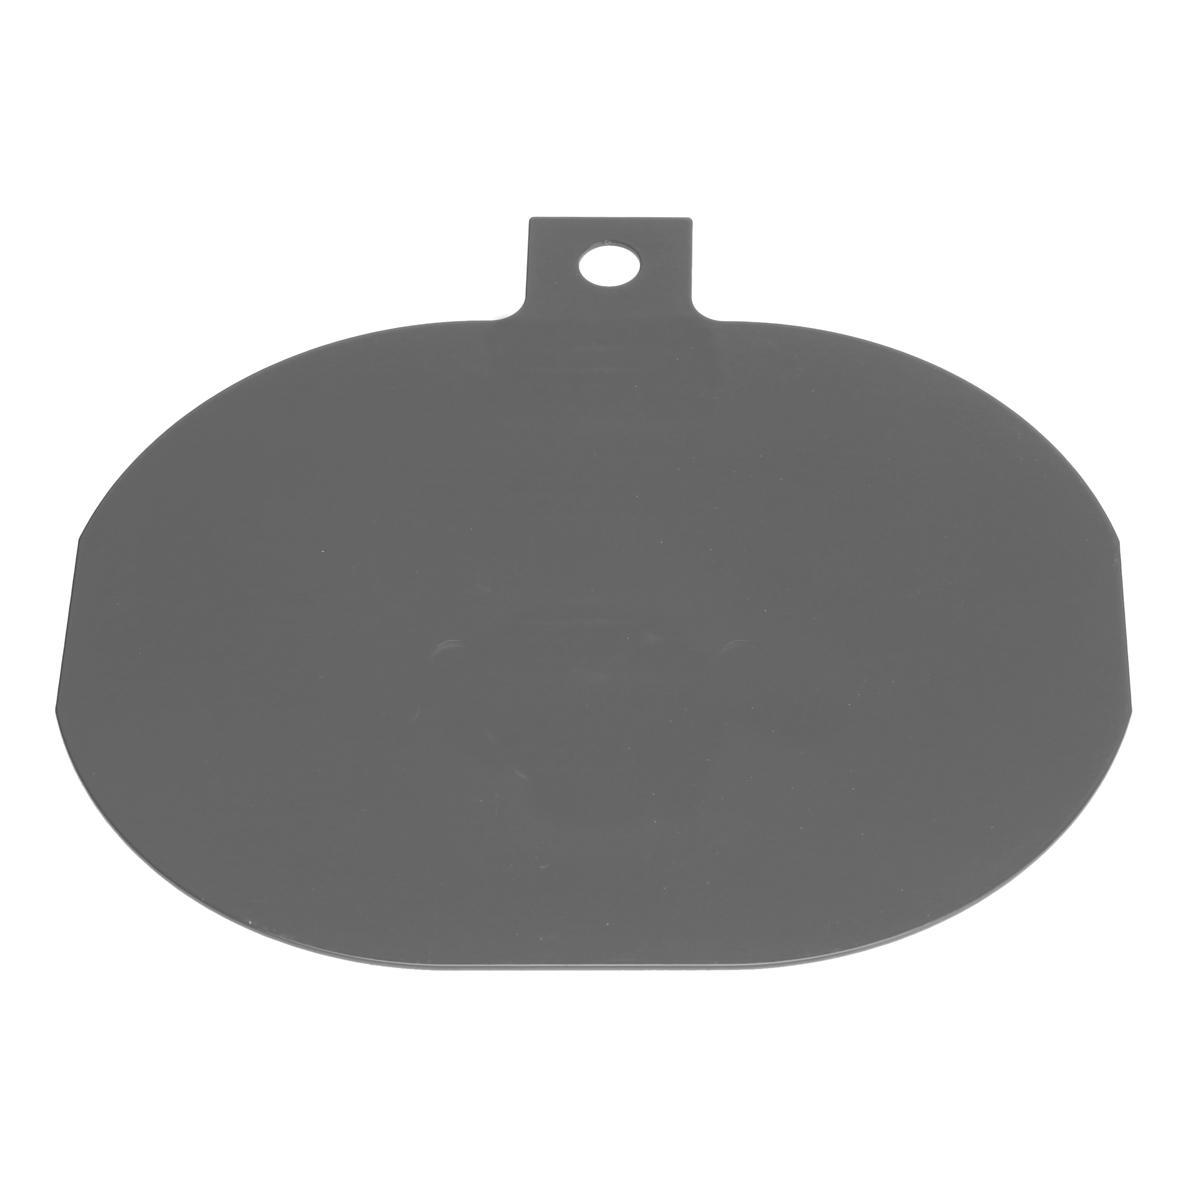 Itg jc20 baseplate 21jc20a from merlin motorsport for Motor base plate design